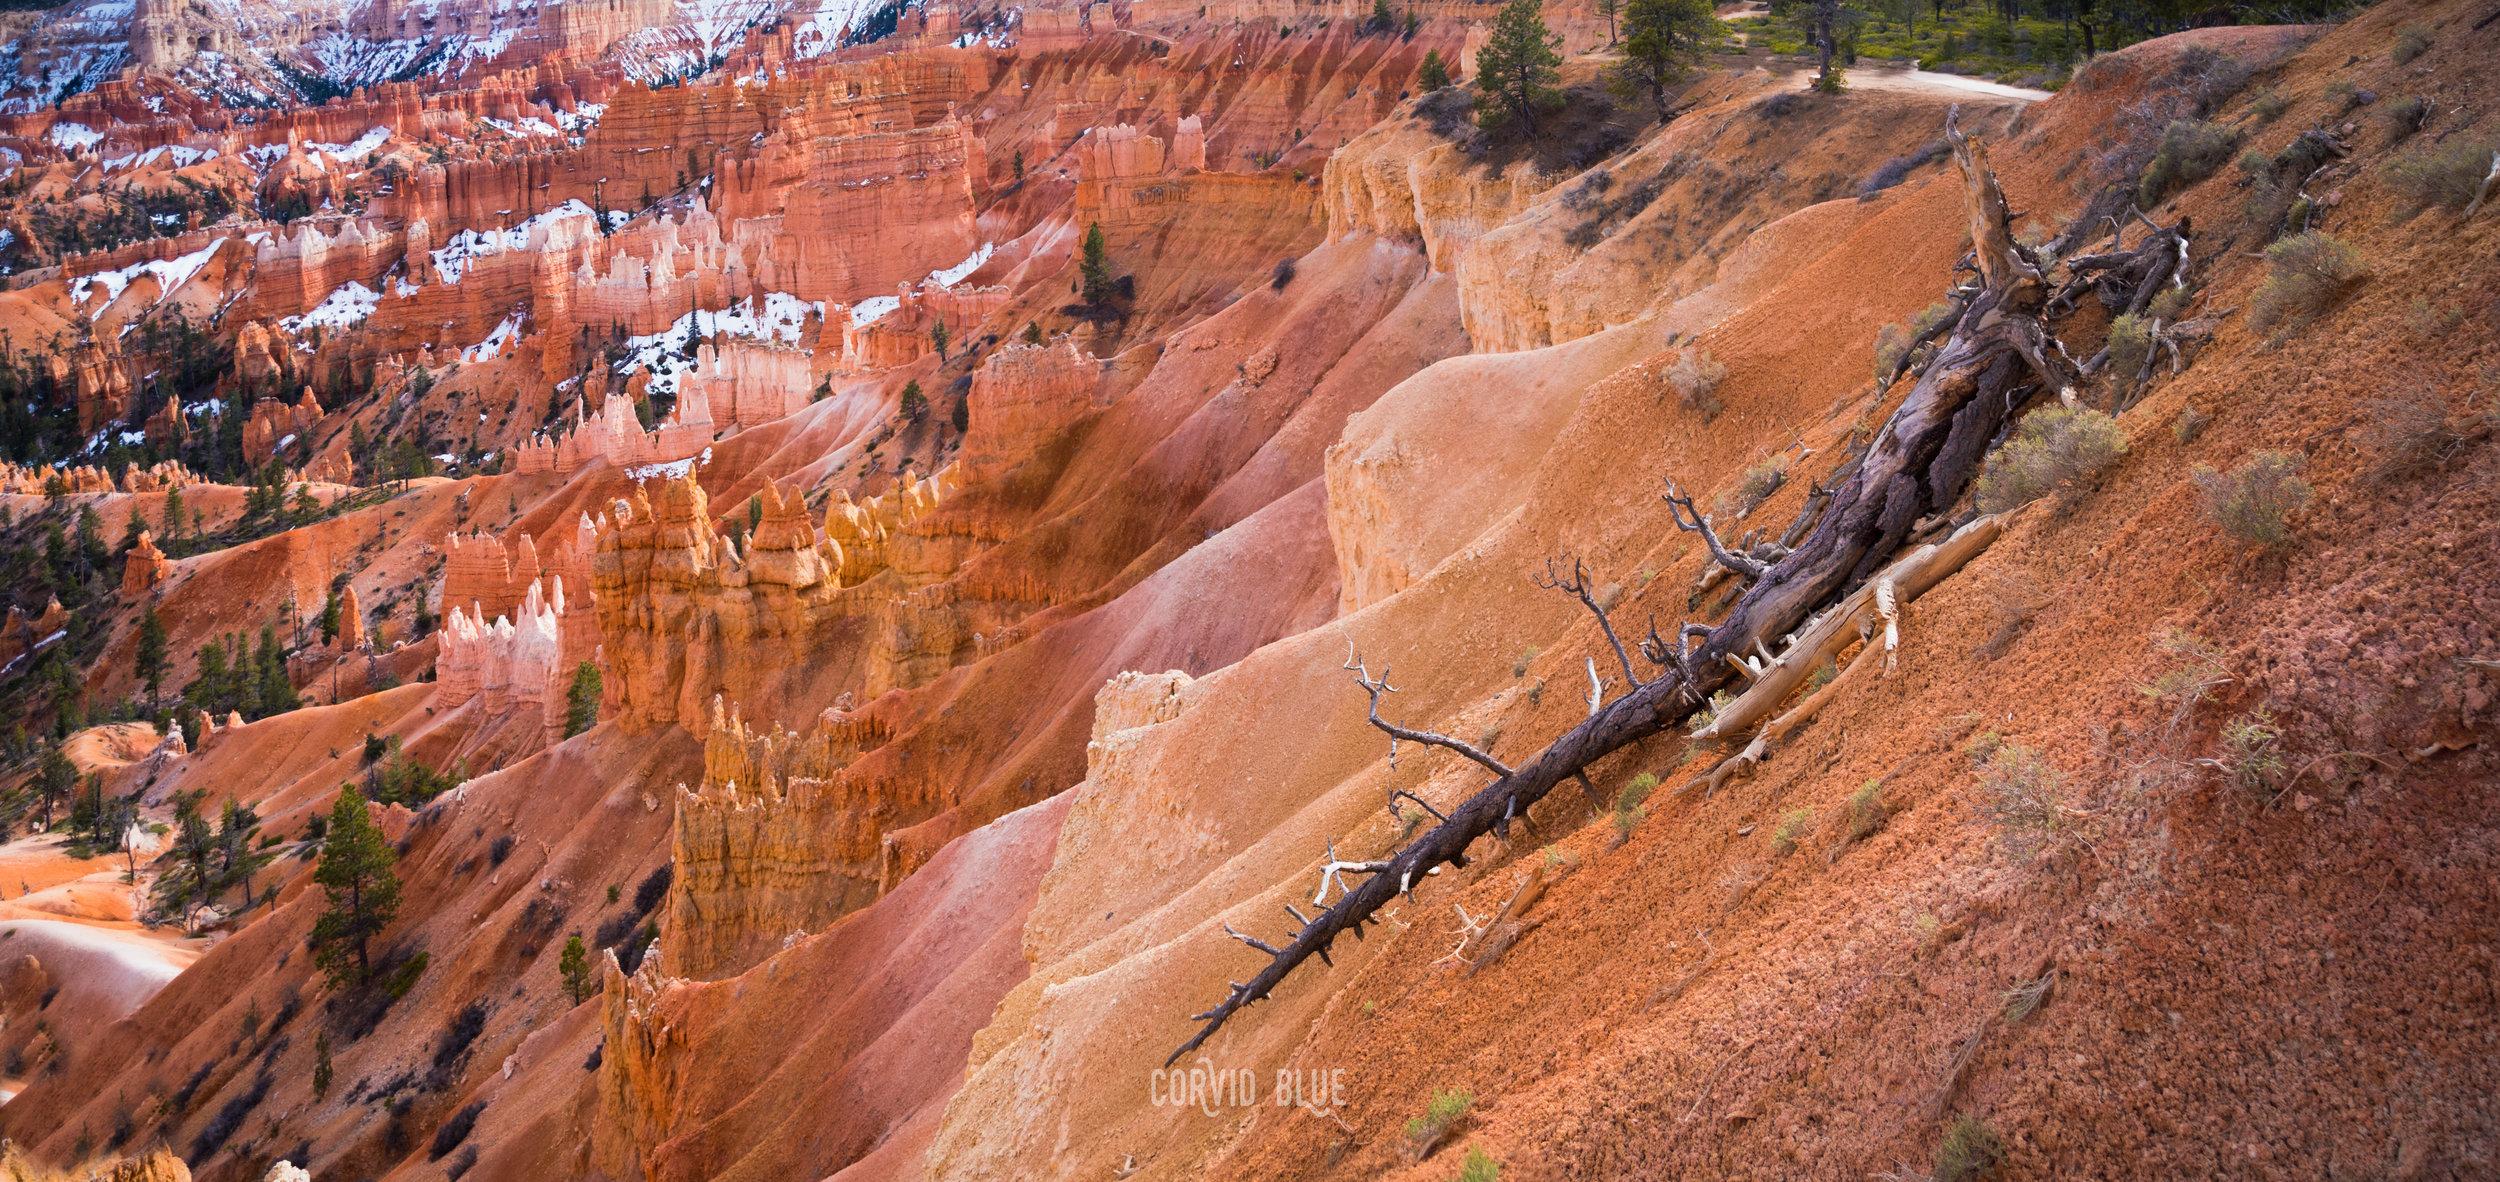 bryce-canyon-national-park_34136392632_o.jpg